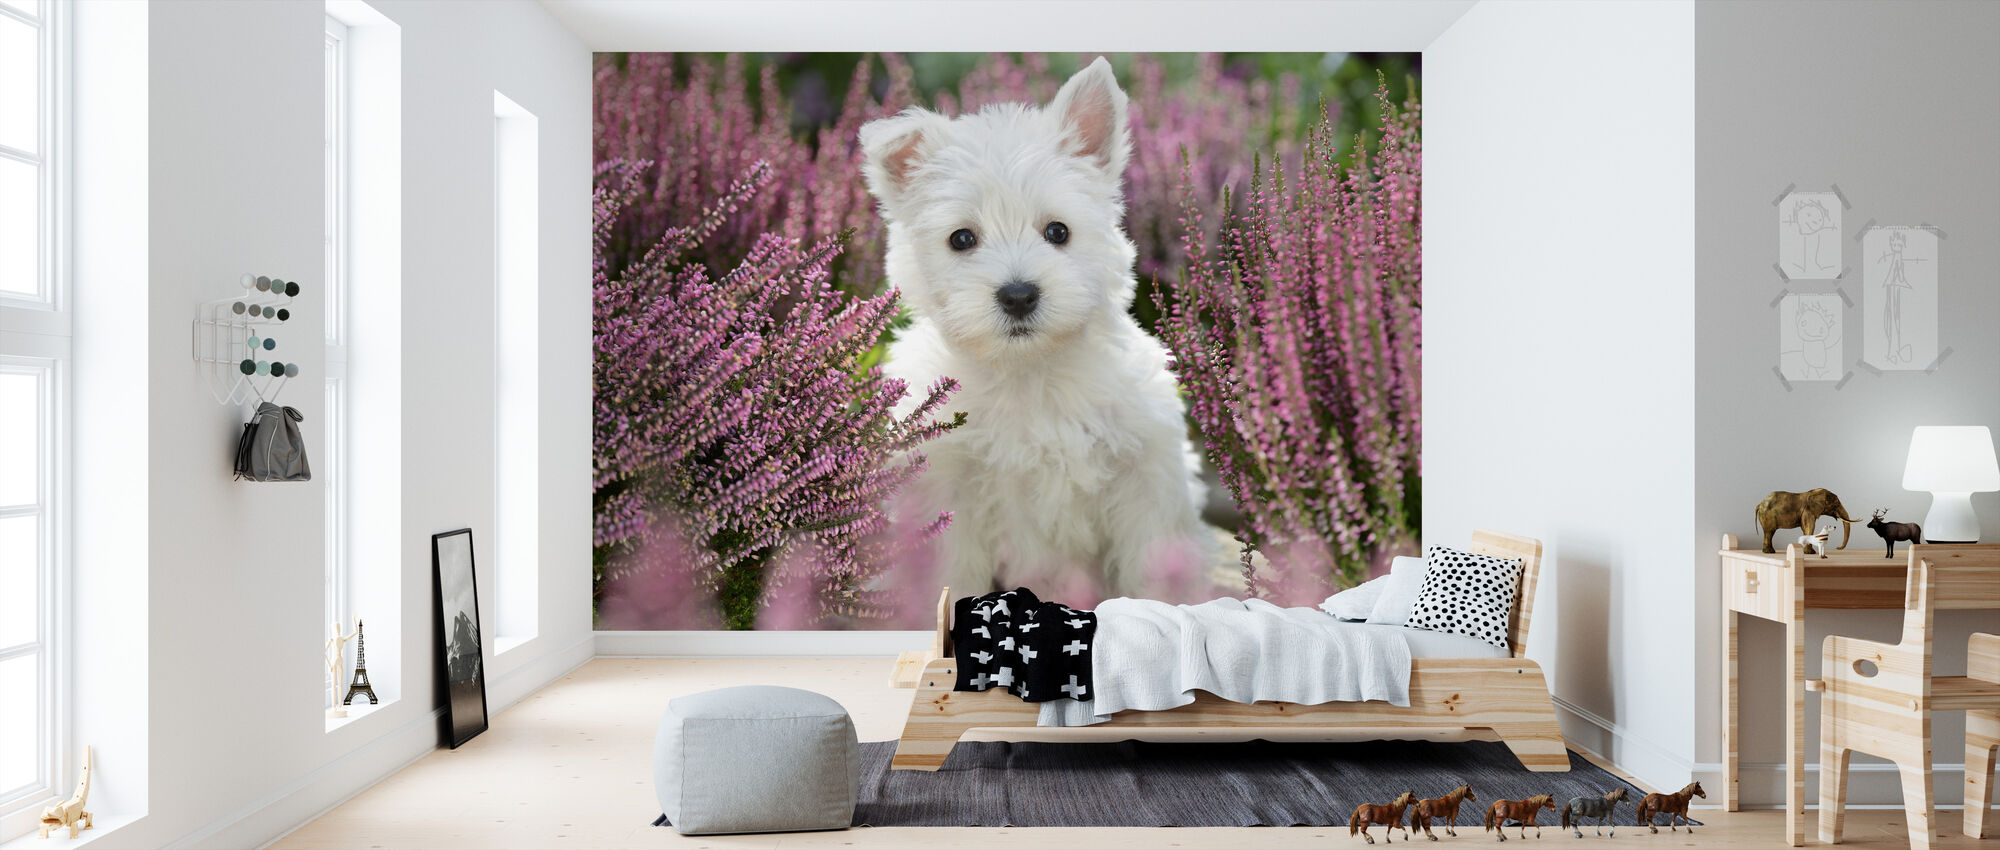 Dog Harmony - Wallpaper - Kids Room